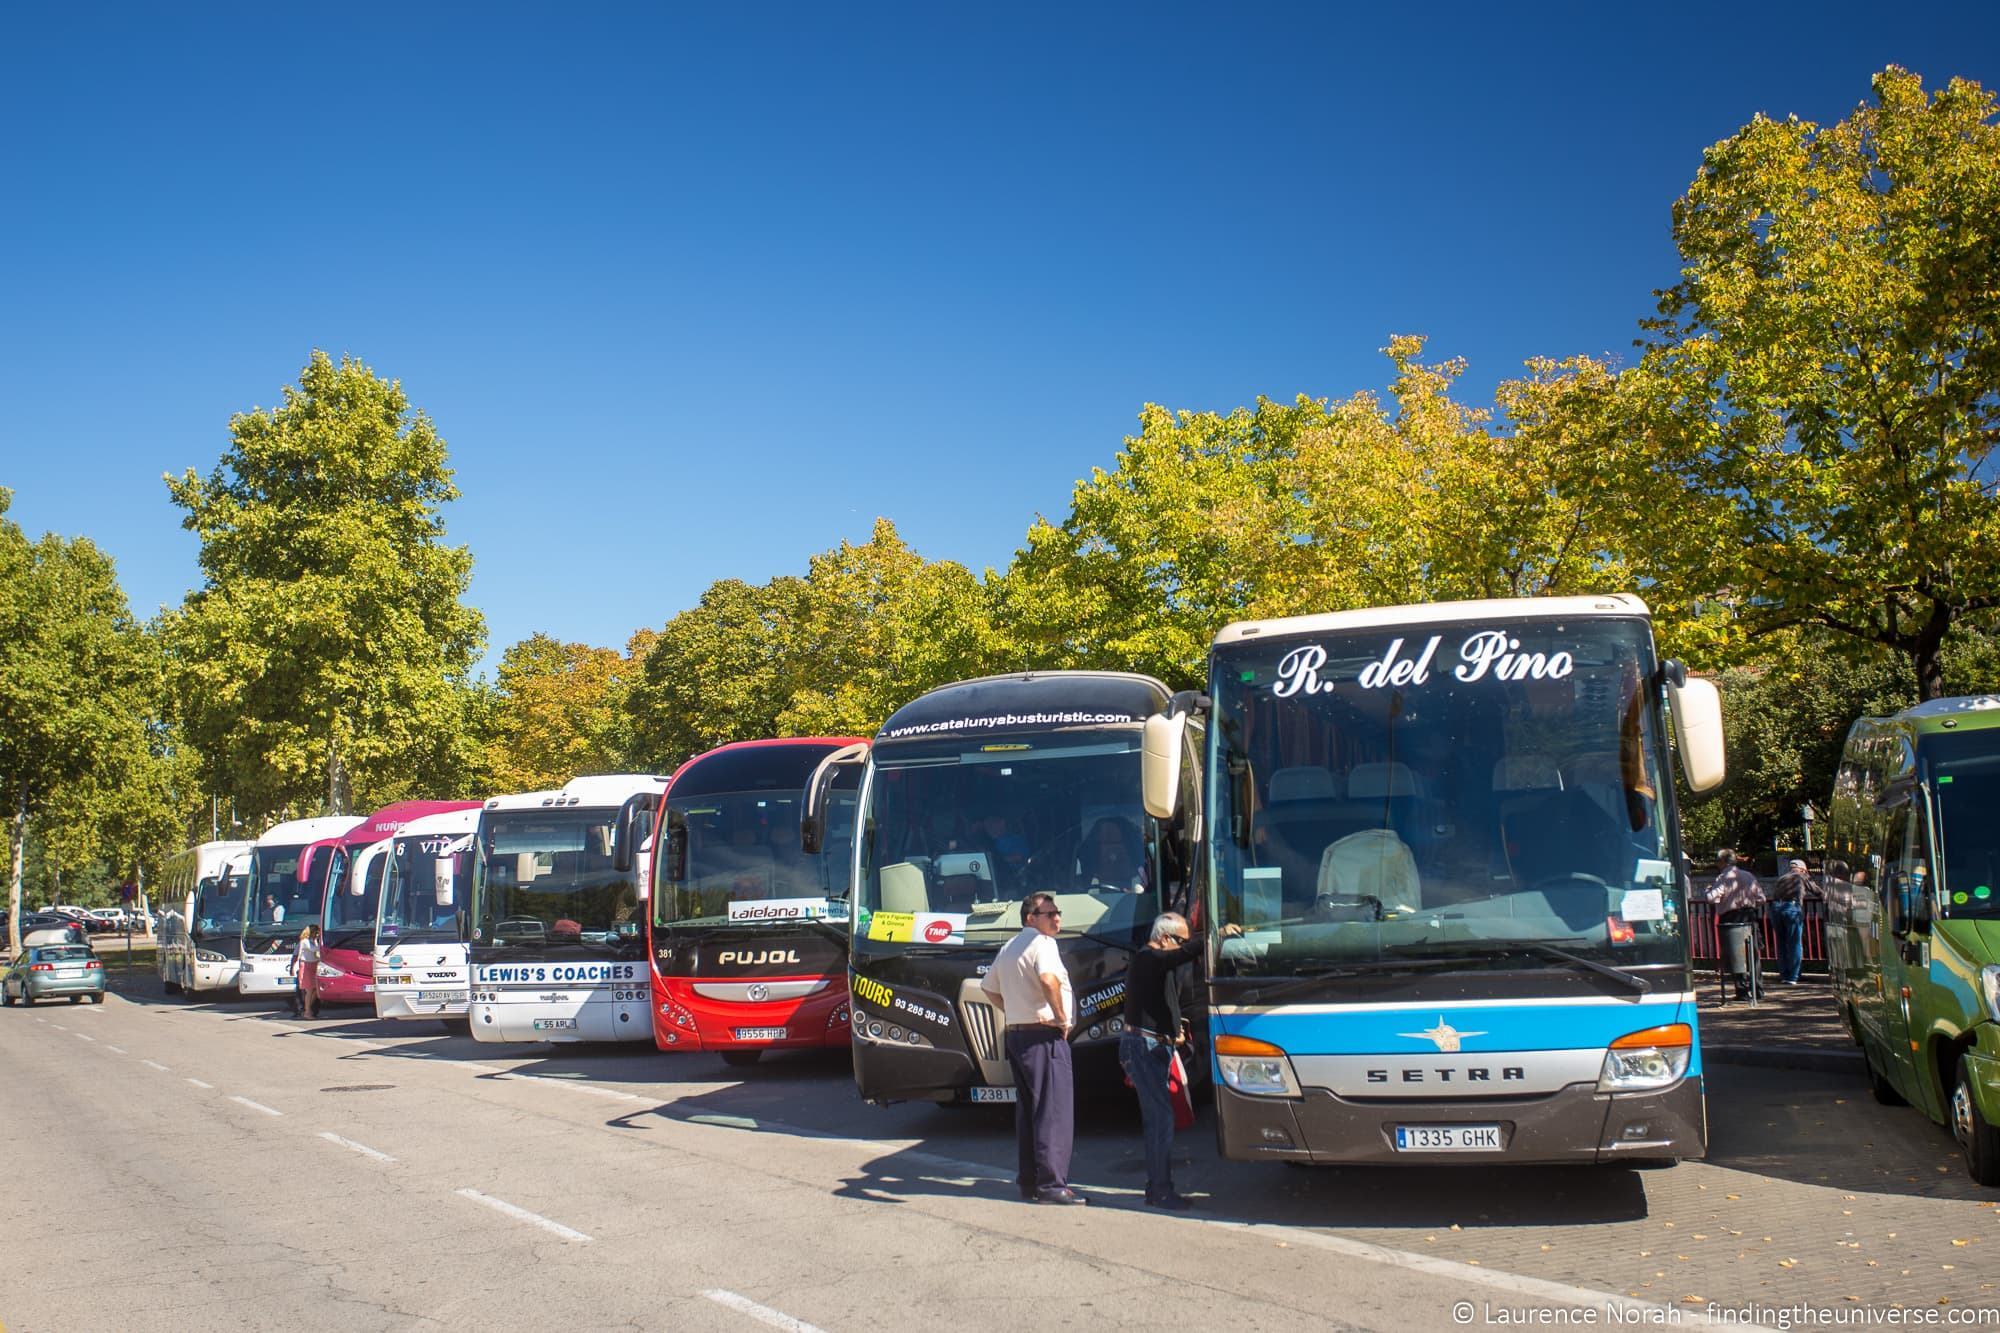 Girona day trips